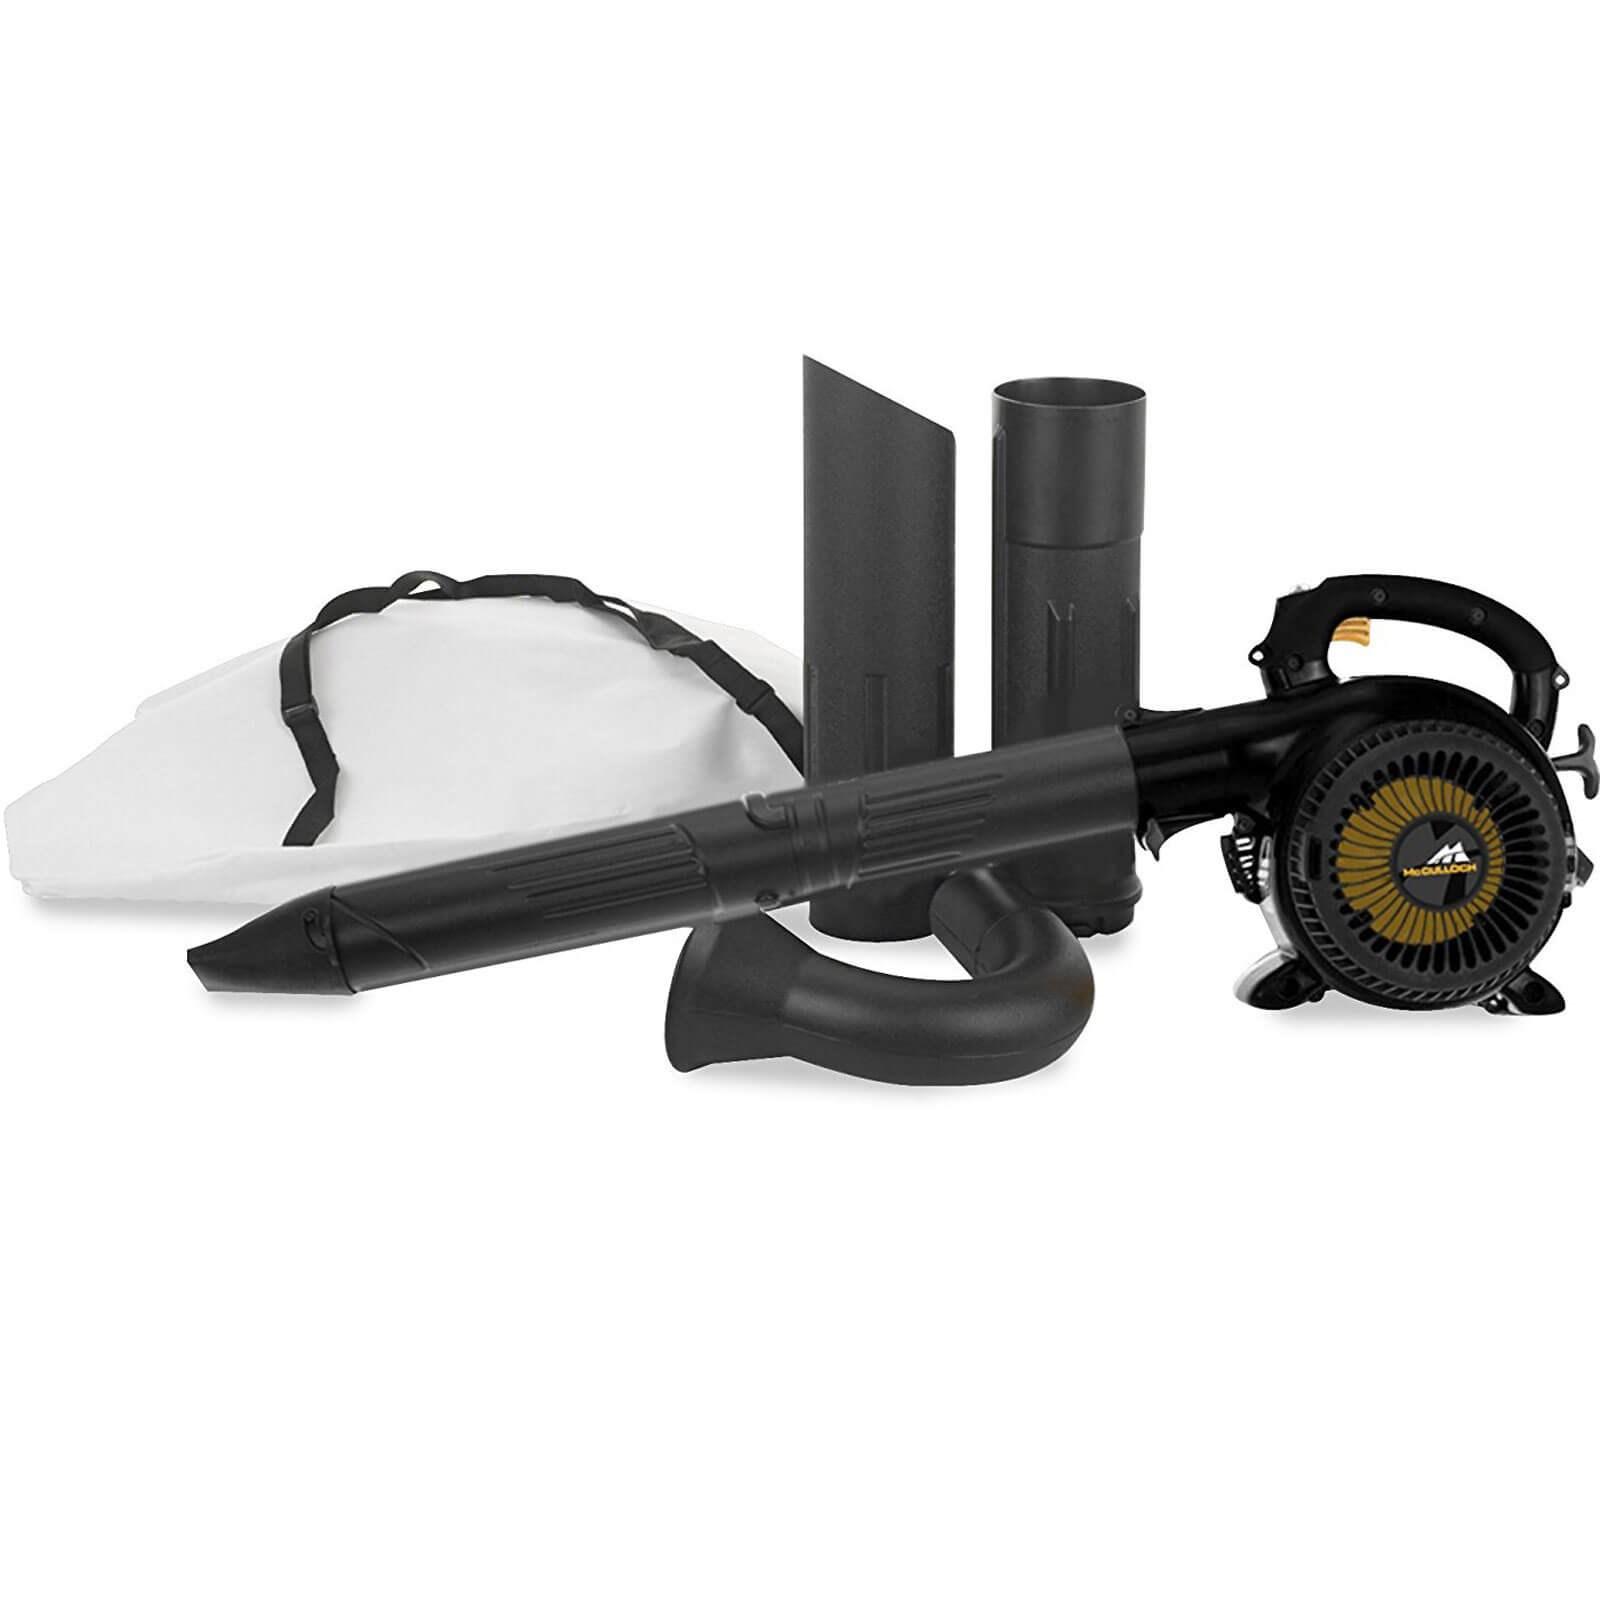 McCulloch GBV 325 Petrol Garden Vacuum and Leaf Blower